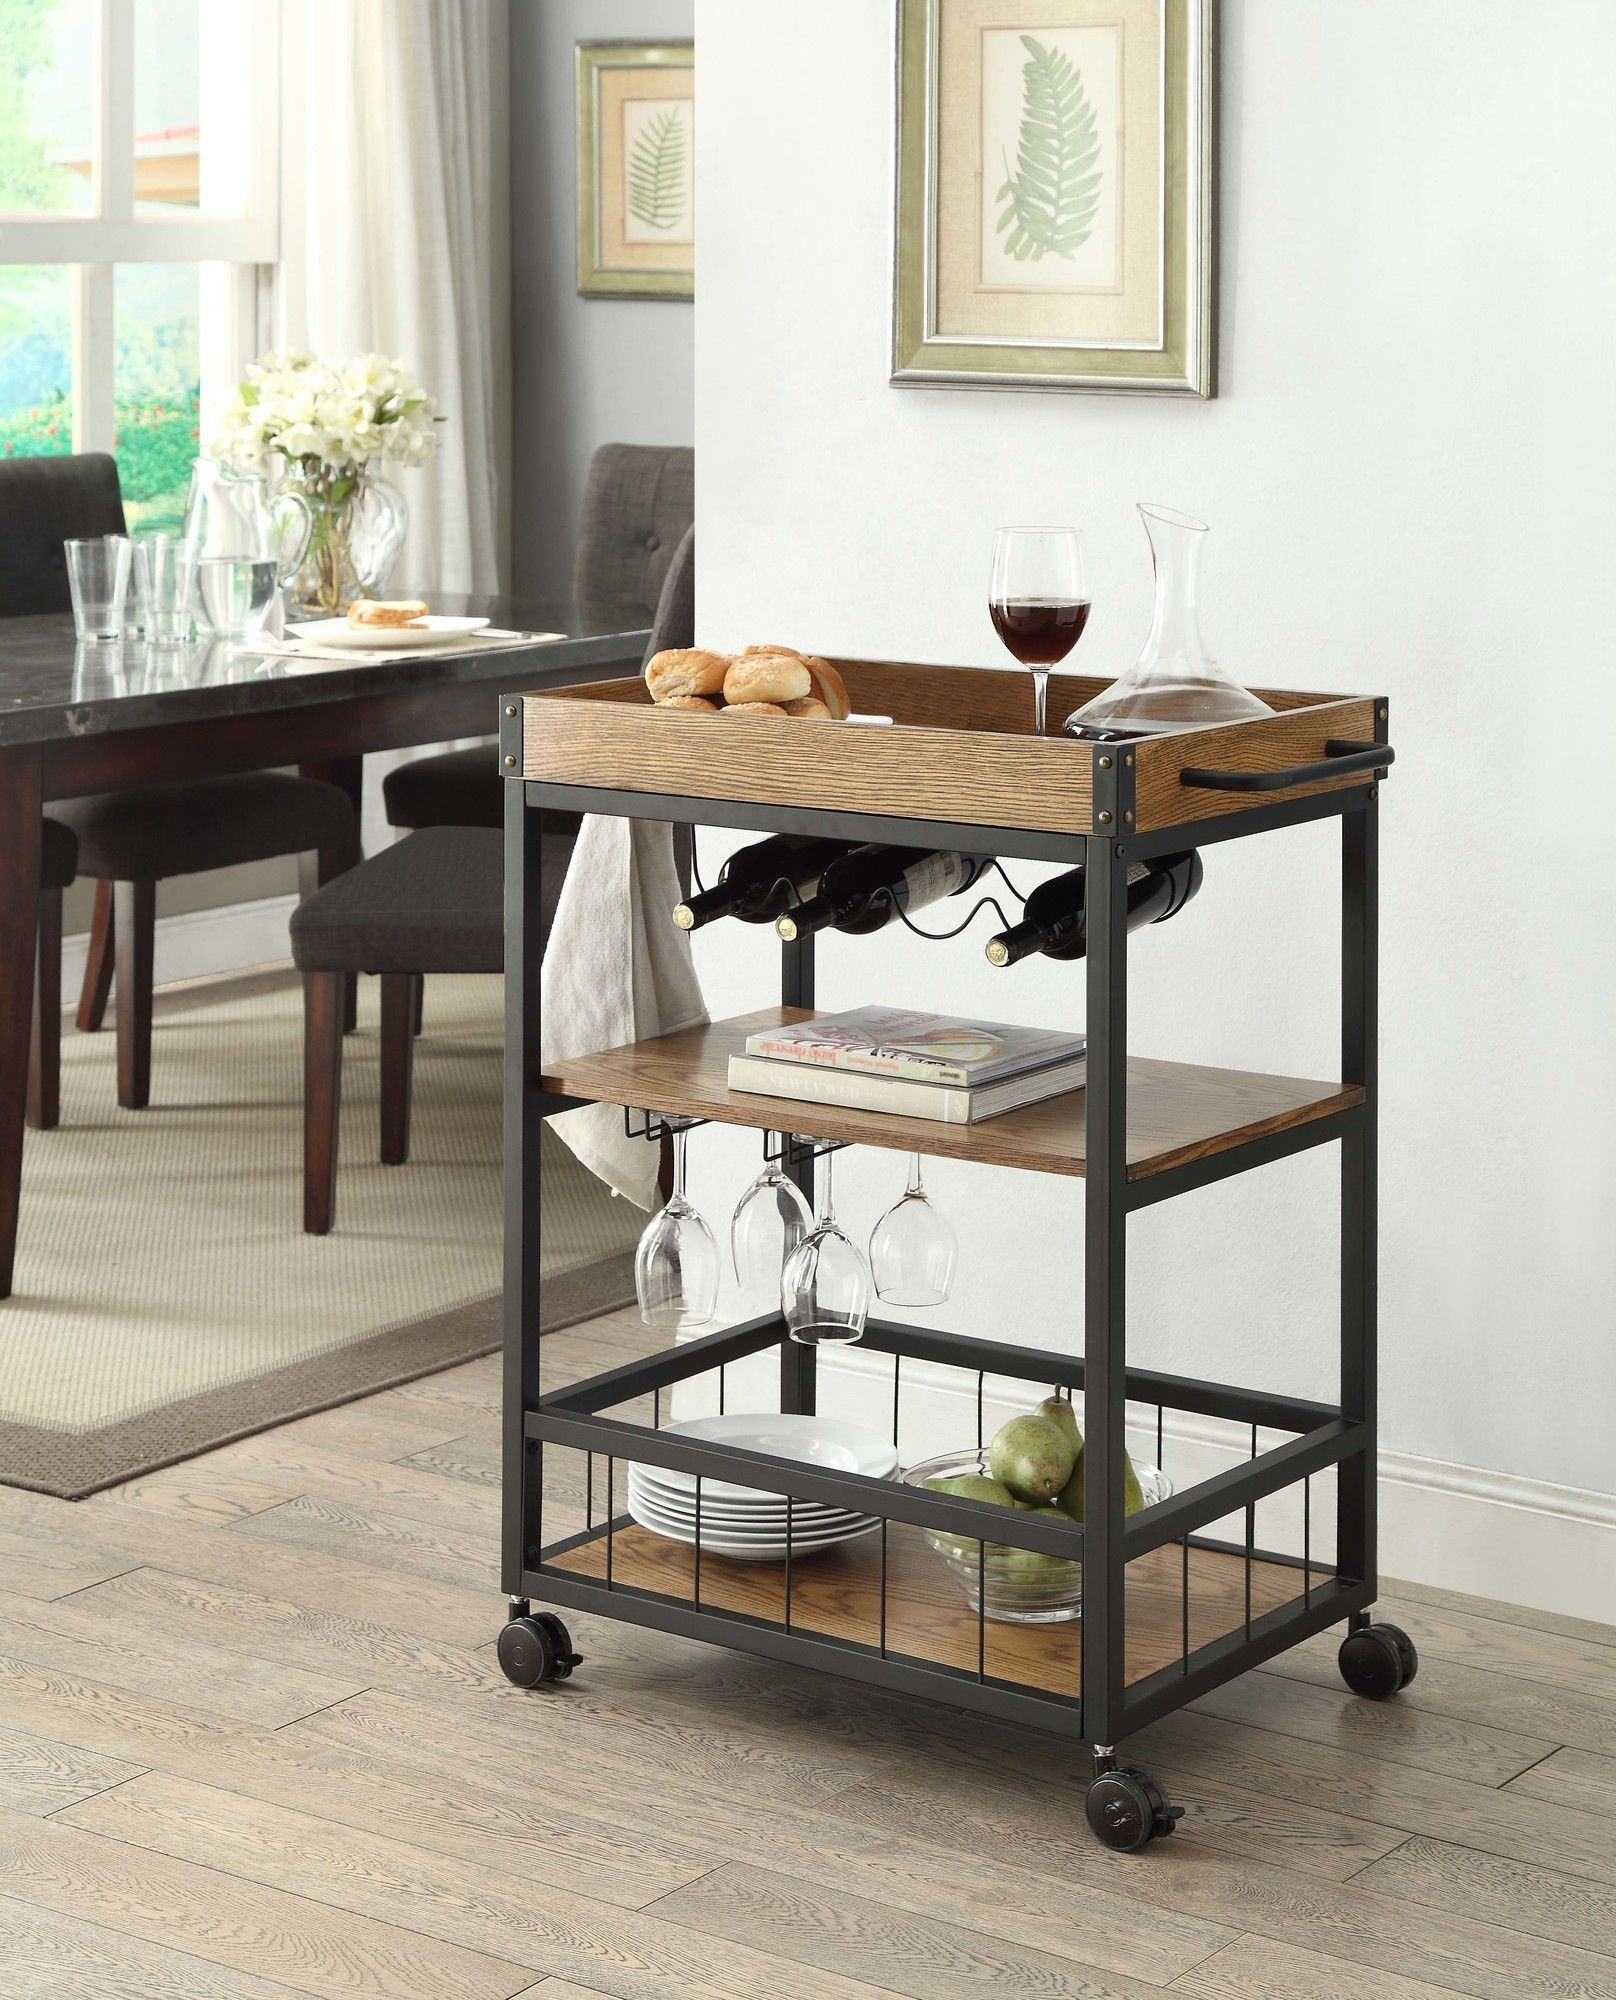 Features Product Type Kitchen Cart Base Finish Black